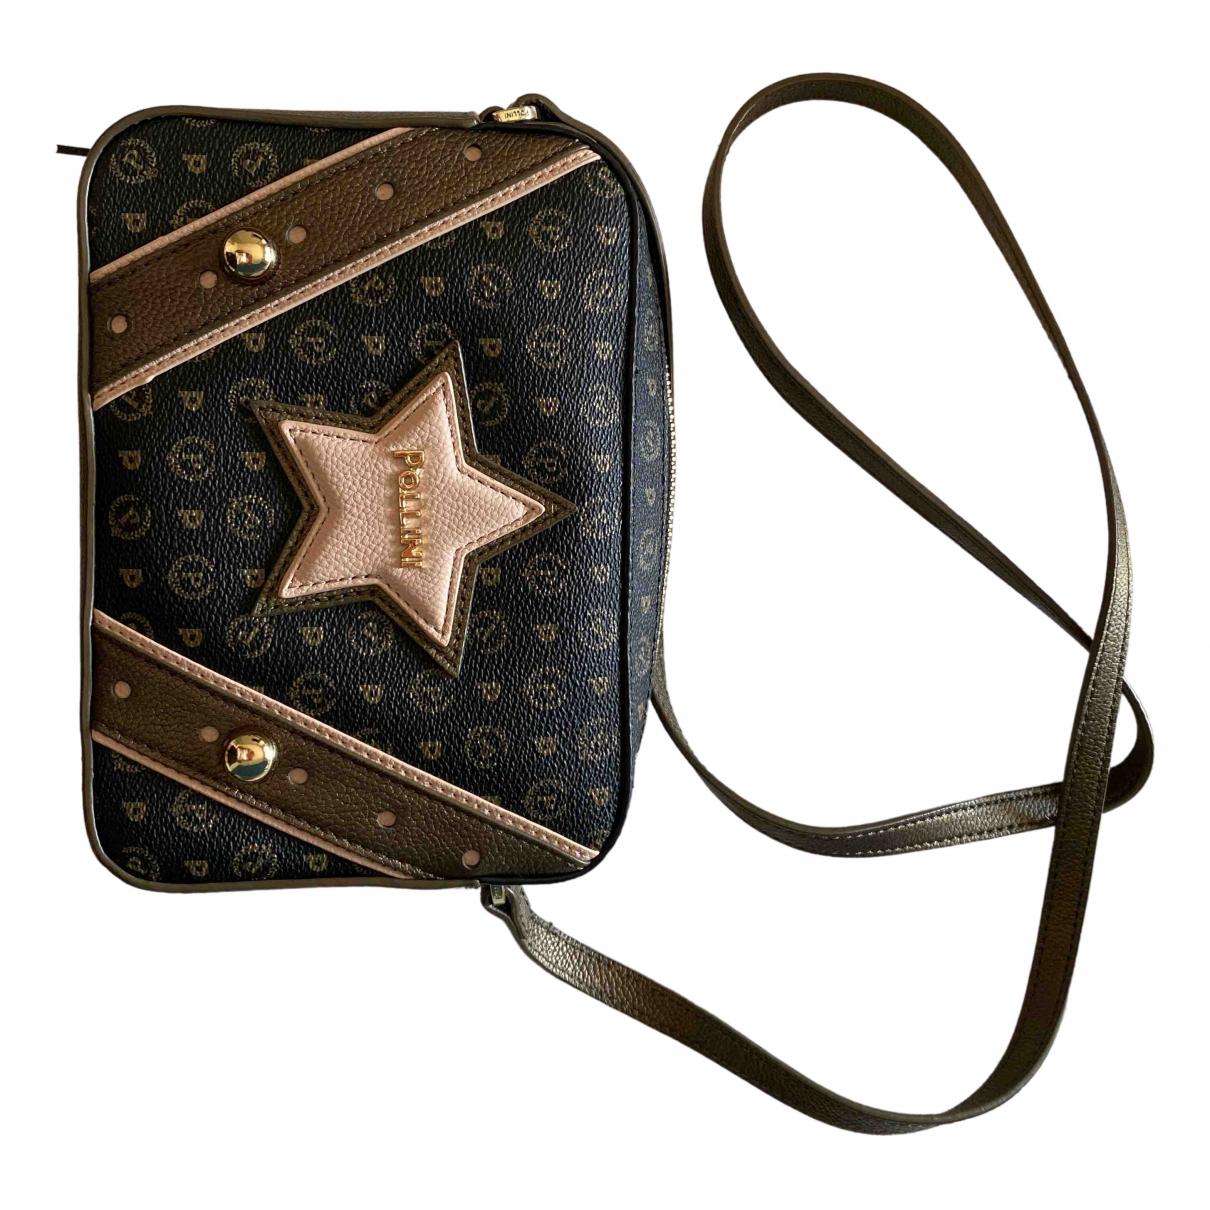 Pollini \N Leather handbag for Women \N